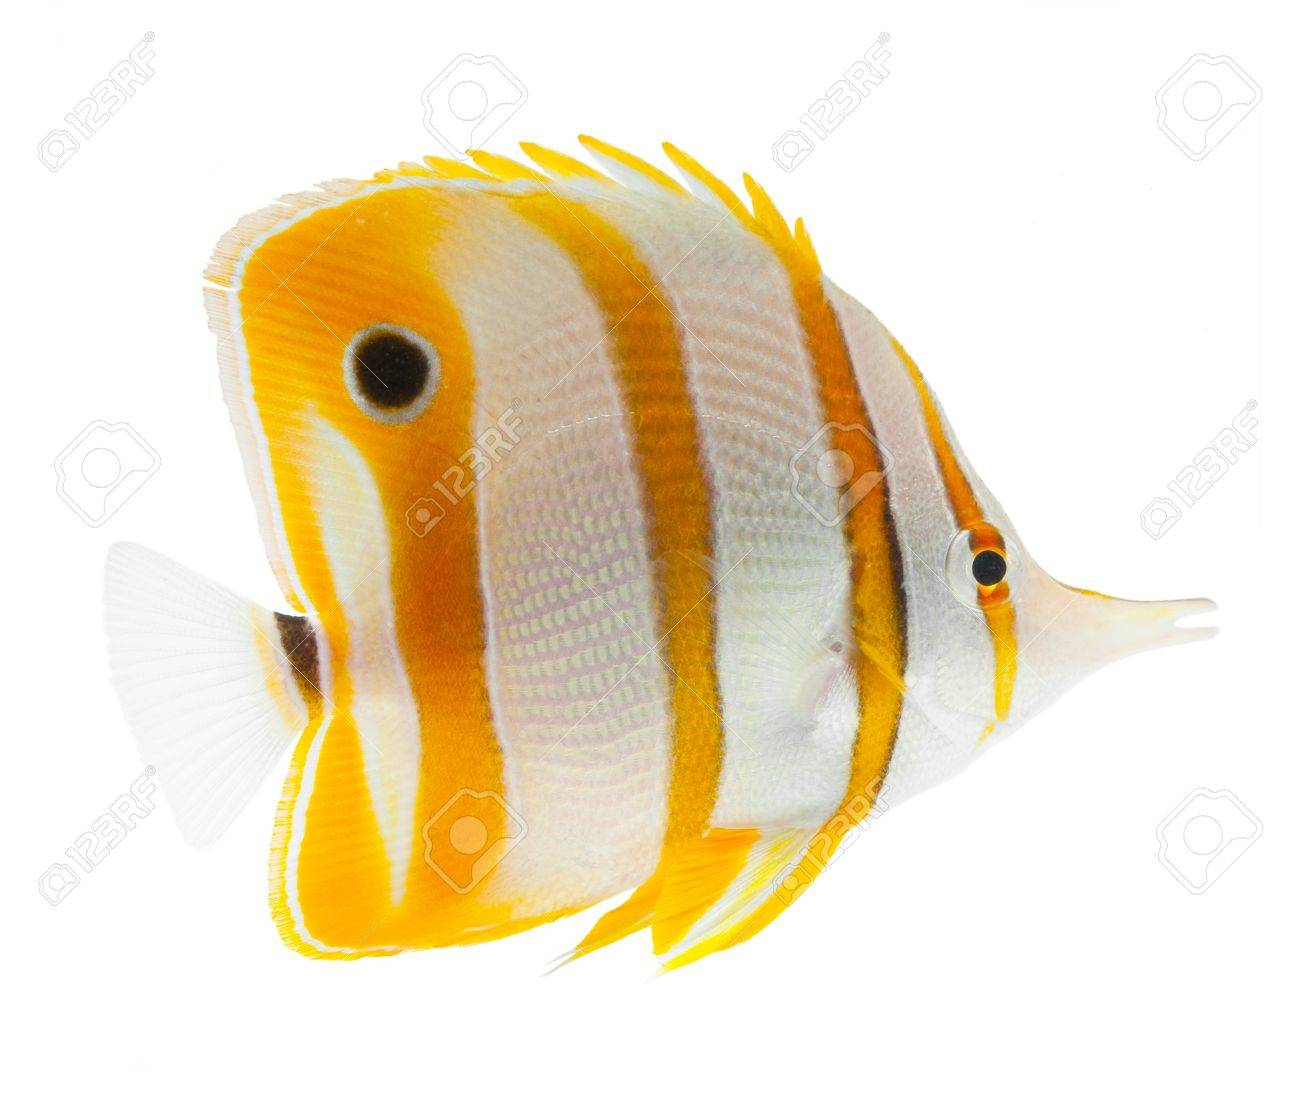 beak coralfish, copperband butterflyfish, isolated on white Stock Photo - 11261773